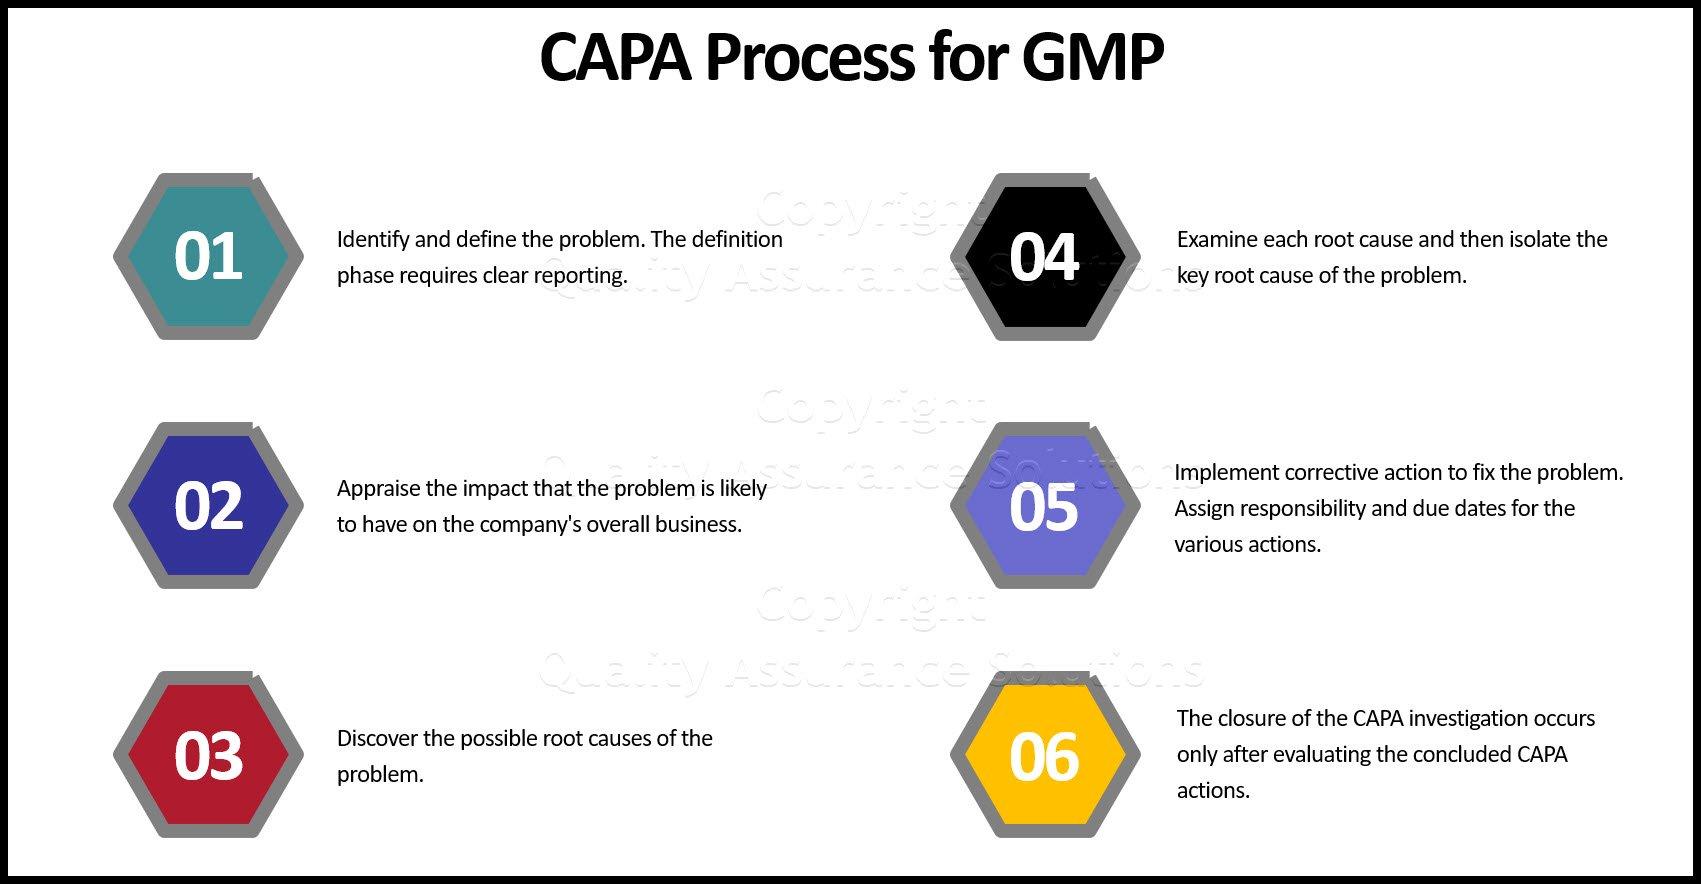 Preventive Corrective Action business slide